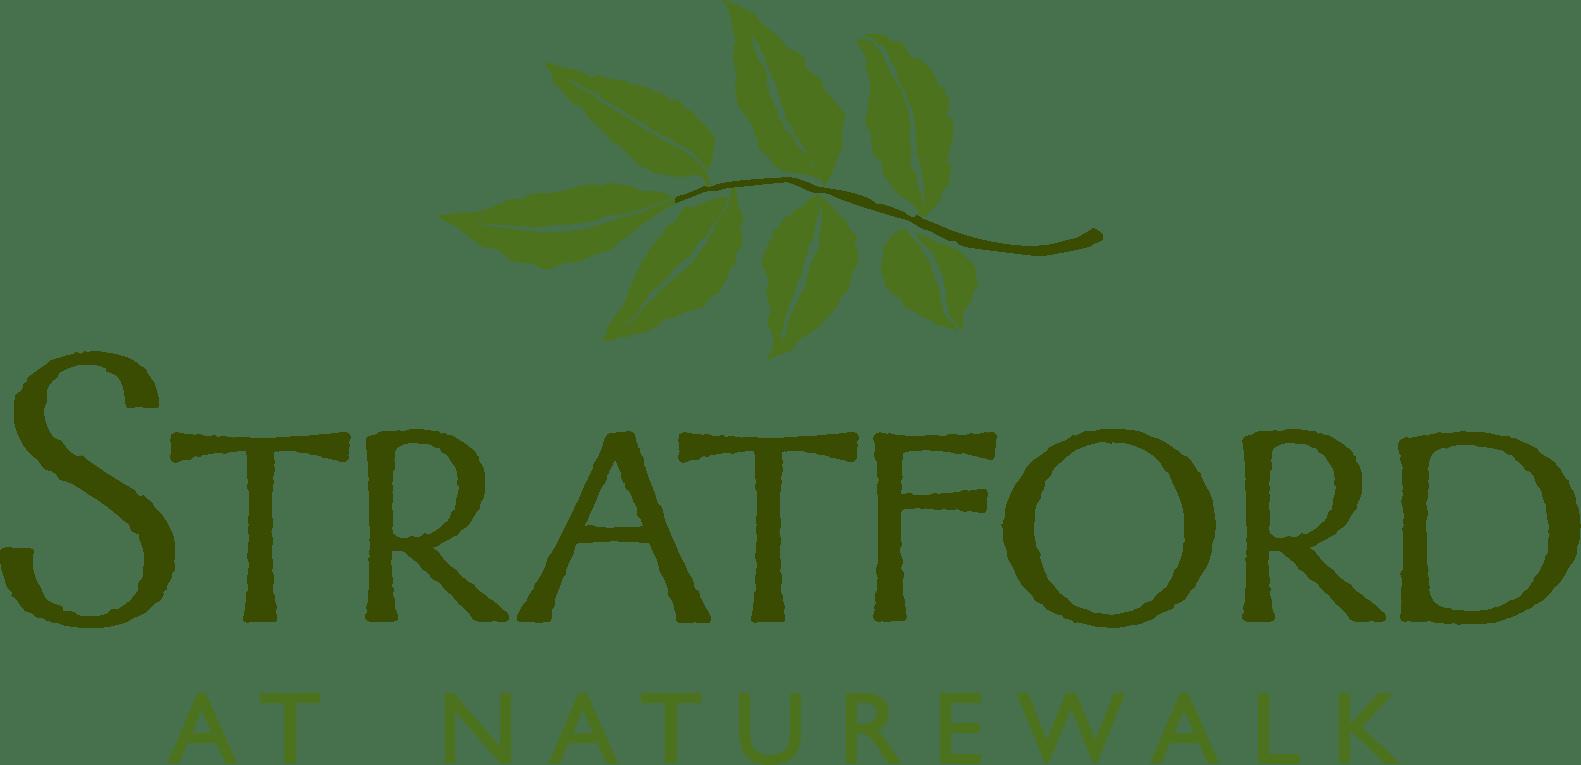 the logo for Stratford at NatureWalk